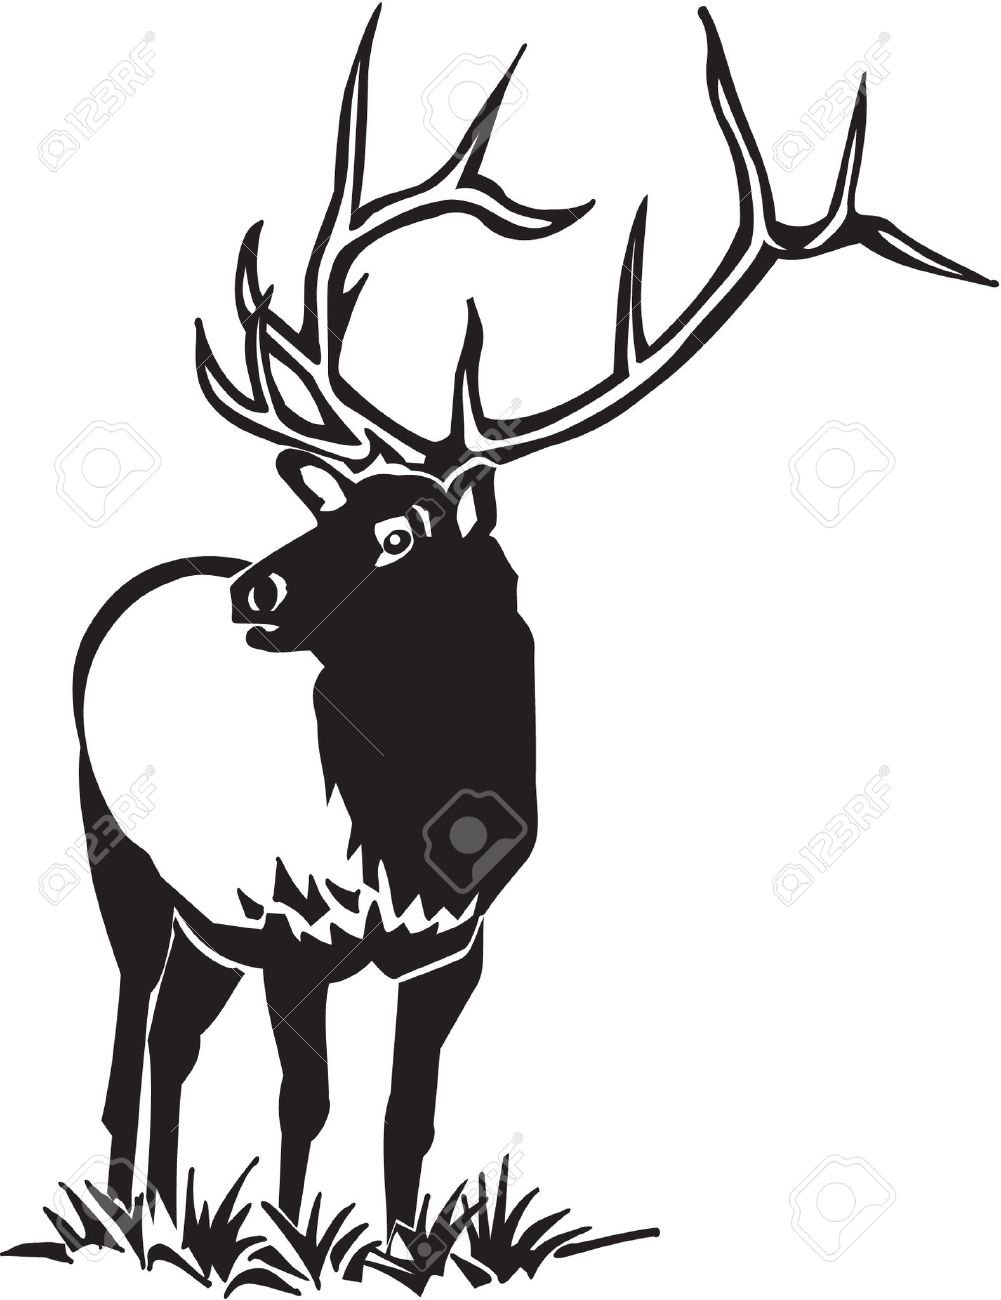 Elk clipart #13, Download drawings